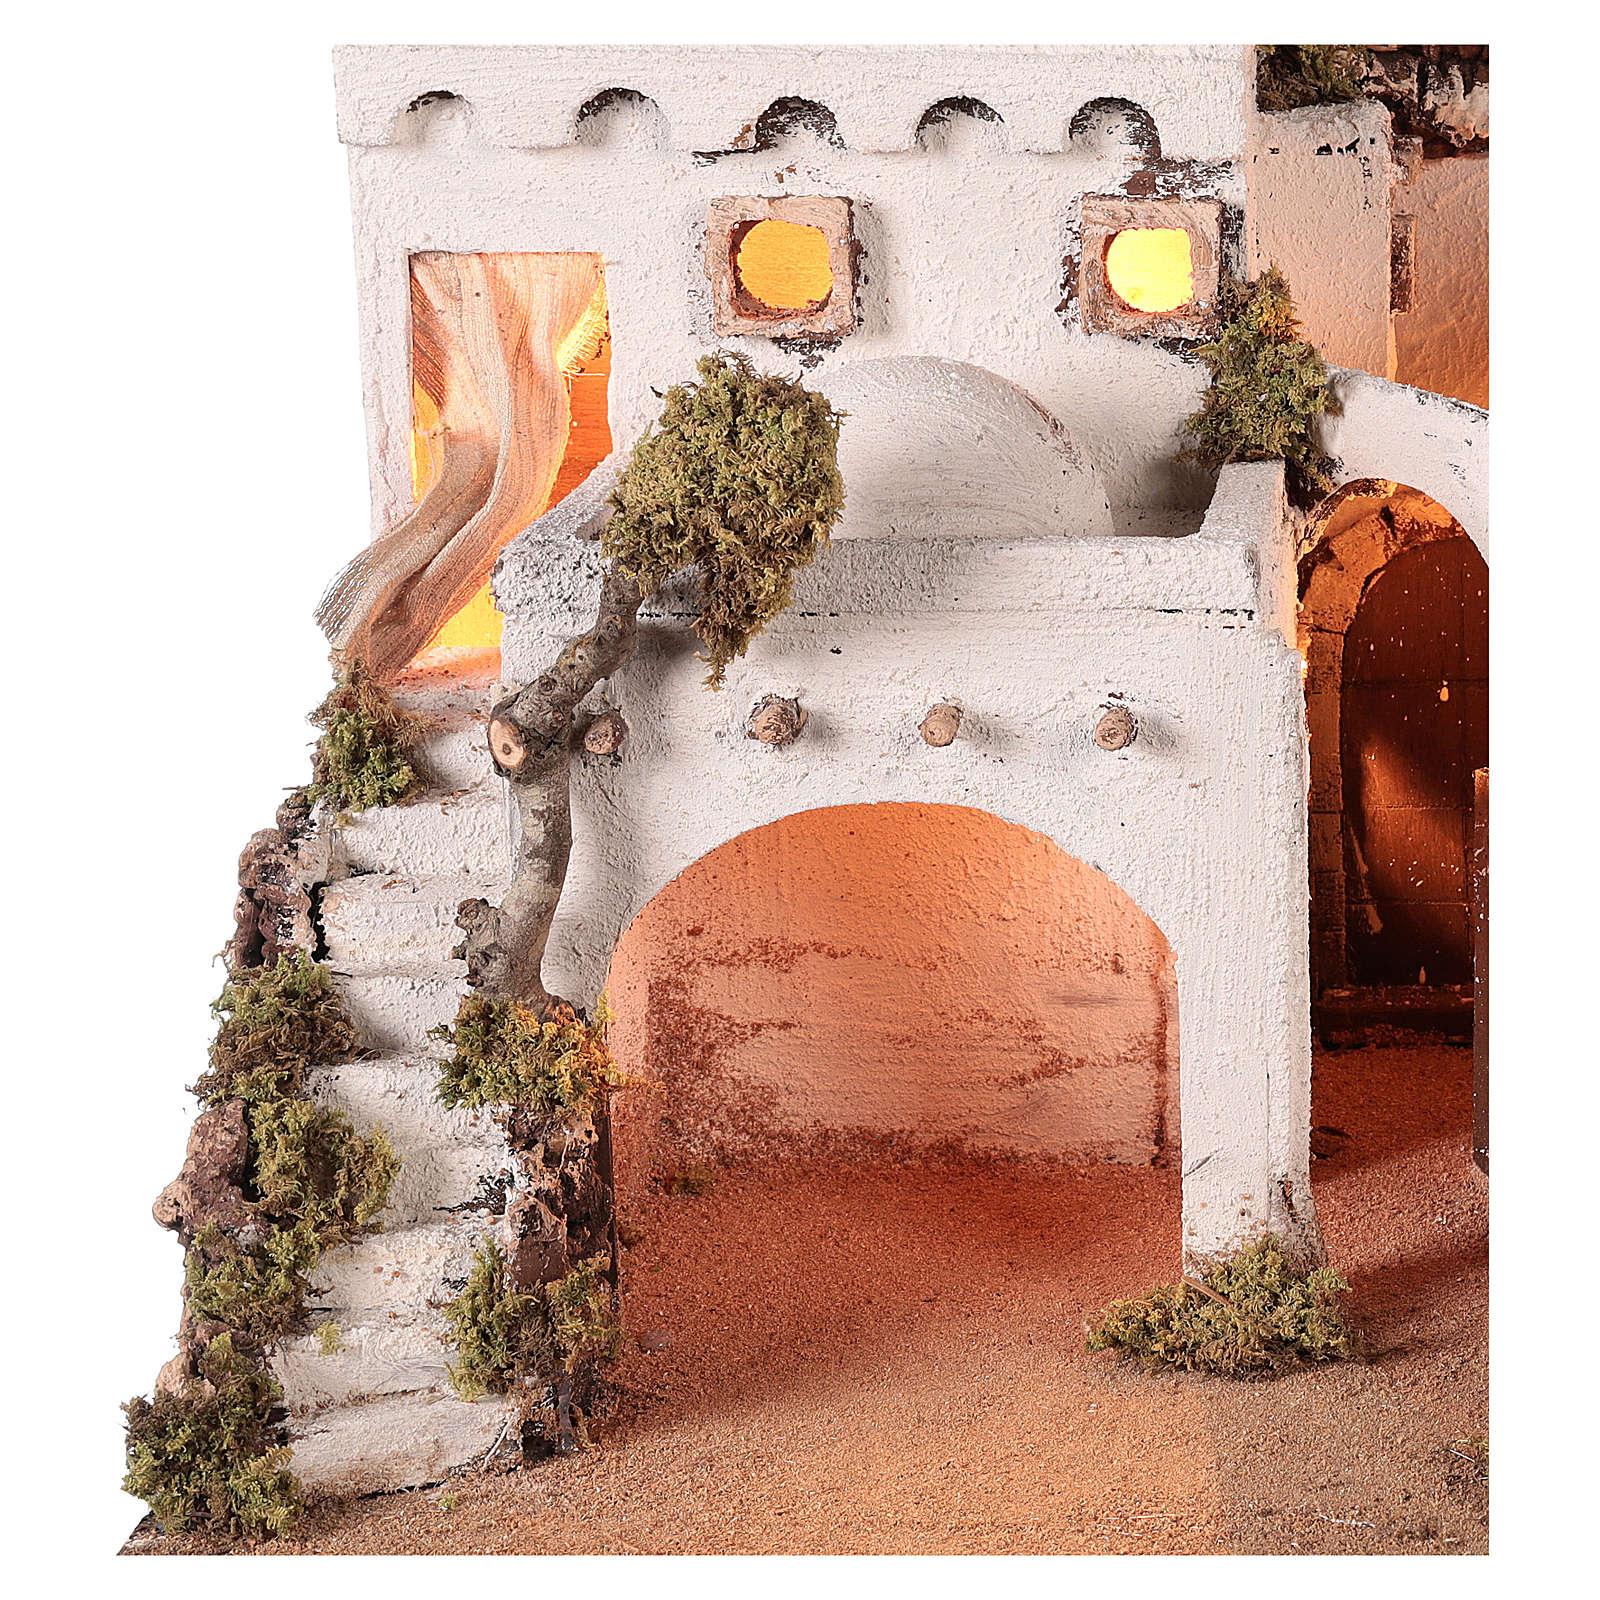 Borgo in stile arabo con tenda per presepe napoletano di 10-12 cm 4